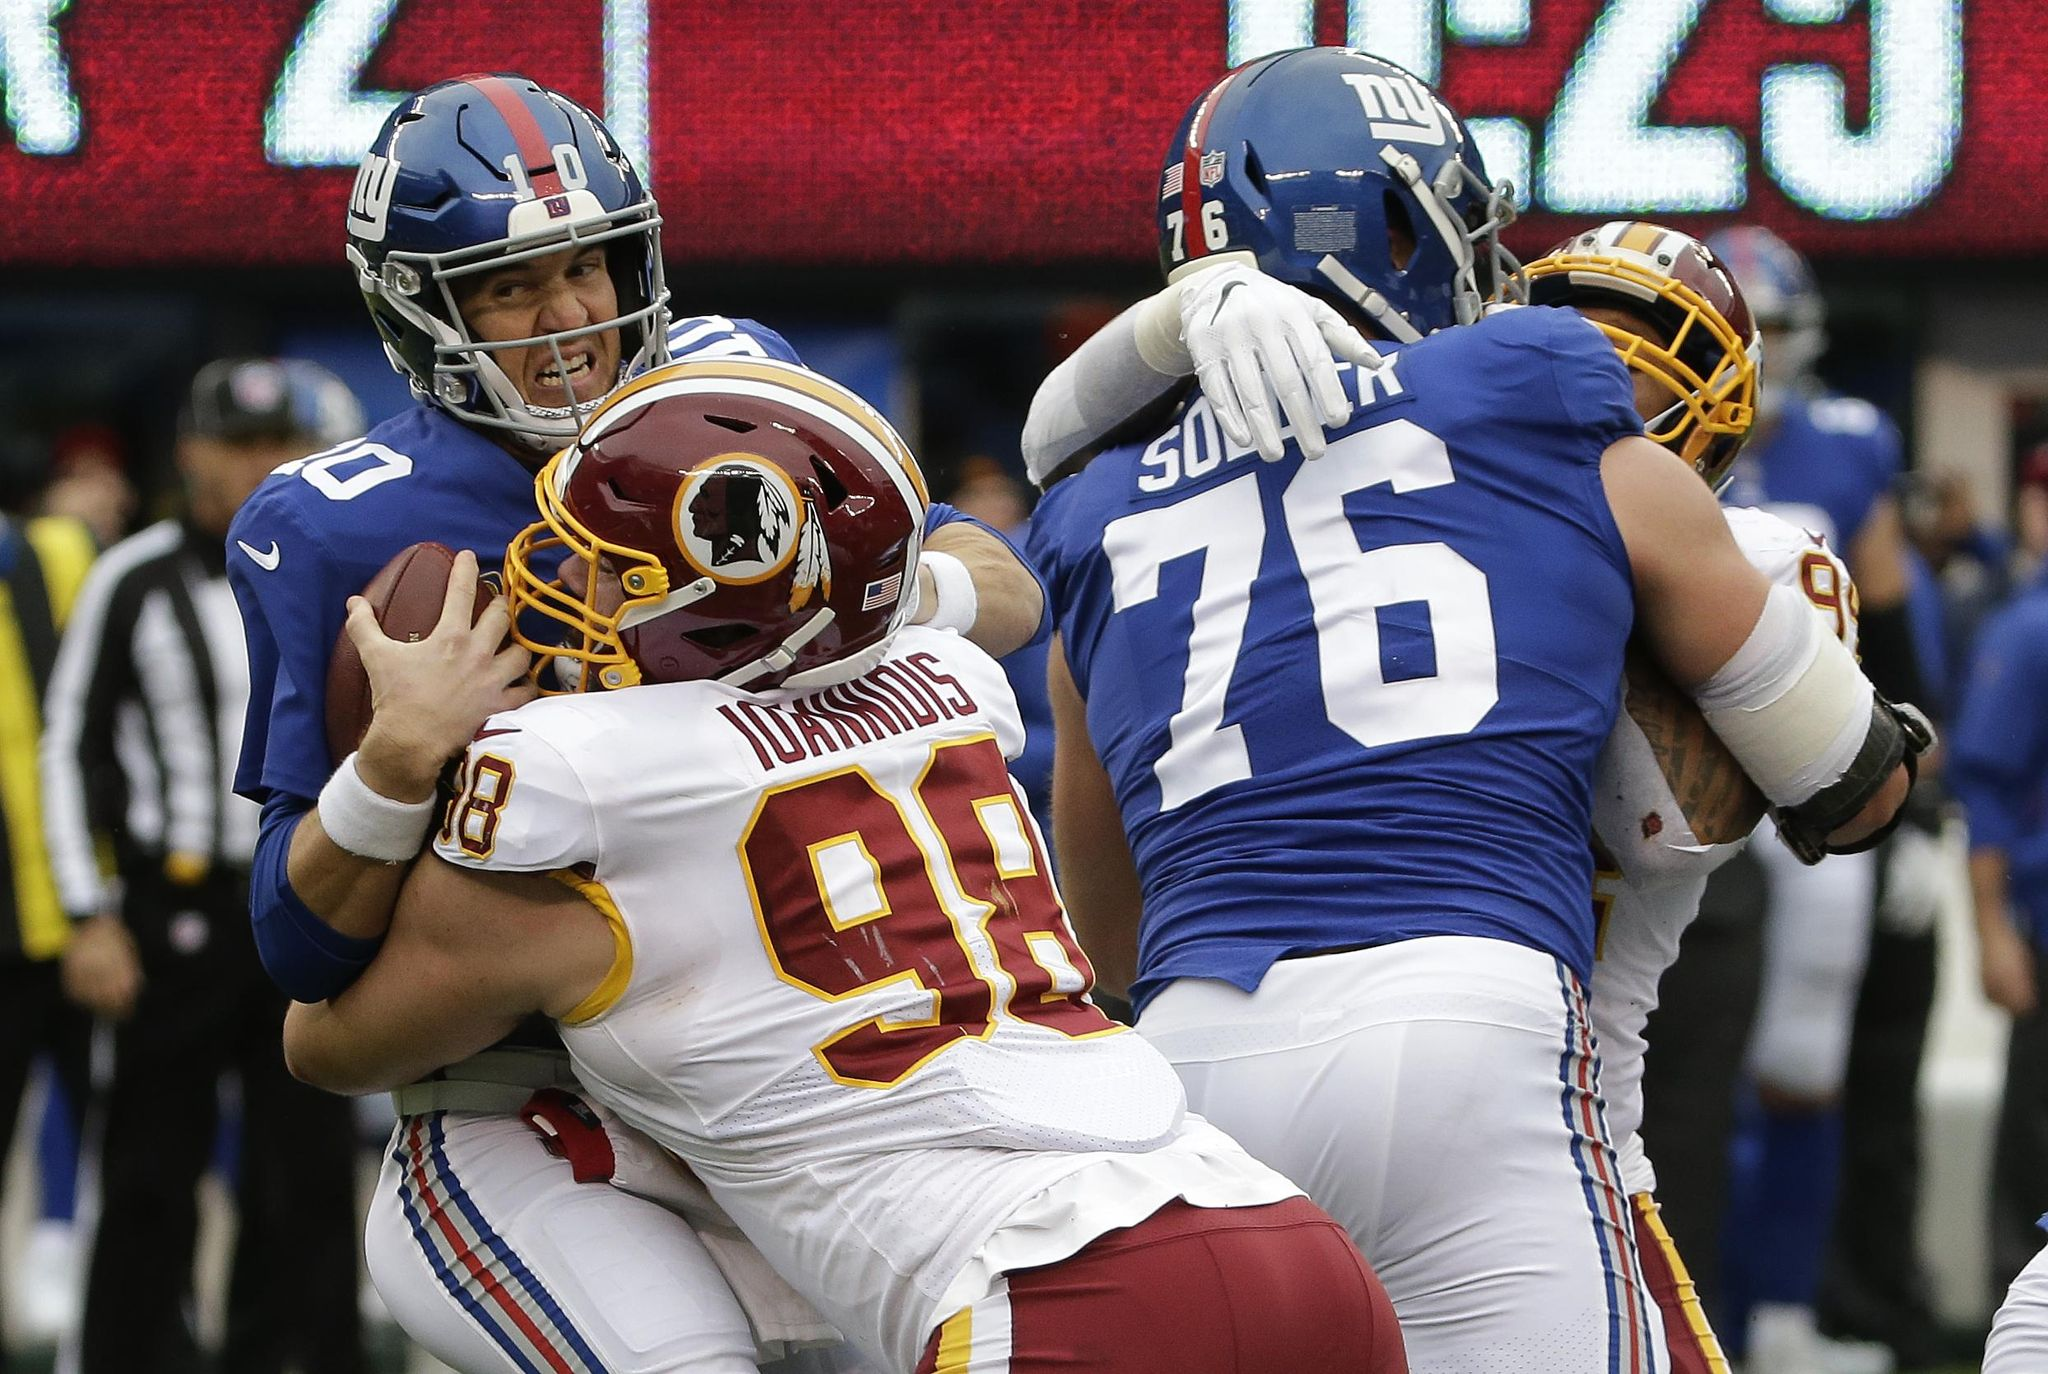 Redskins_giants_football_80993_s2048x1374